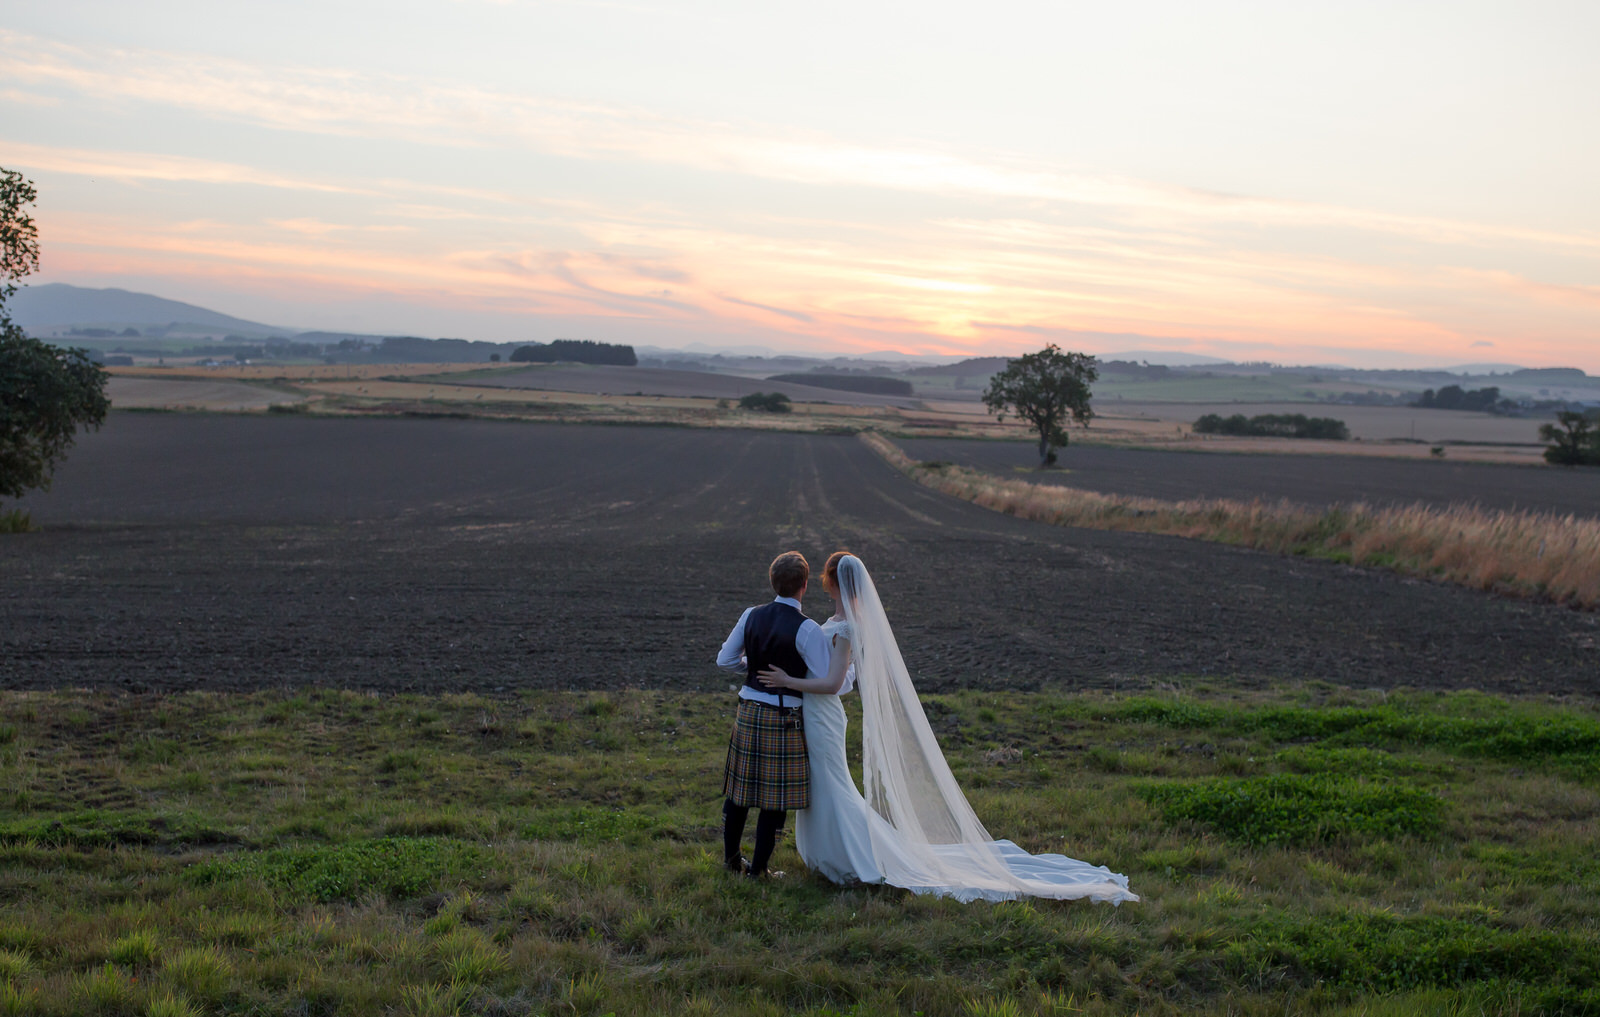 weddings at the barn at Barra, barn at barra castle, barra barn weddings